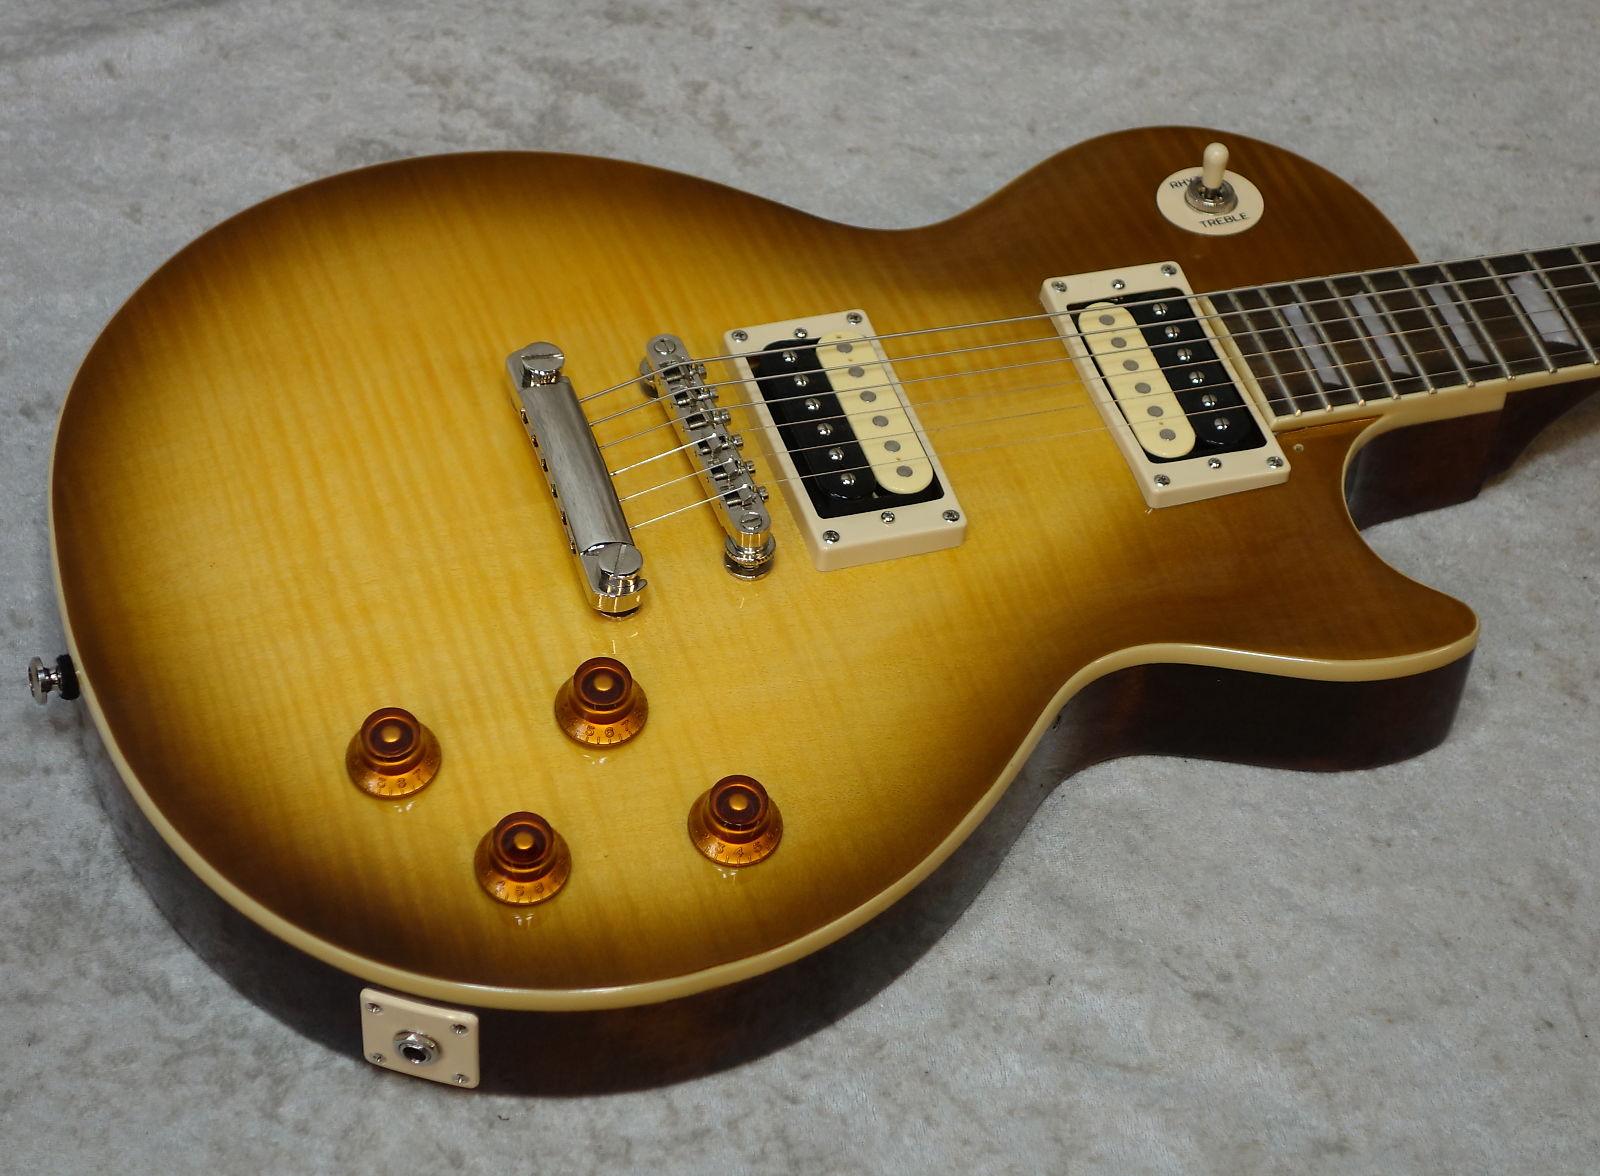 Epiphone Les Paul Standard Electric Guitar In Honey Burst Finish